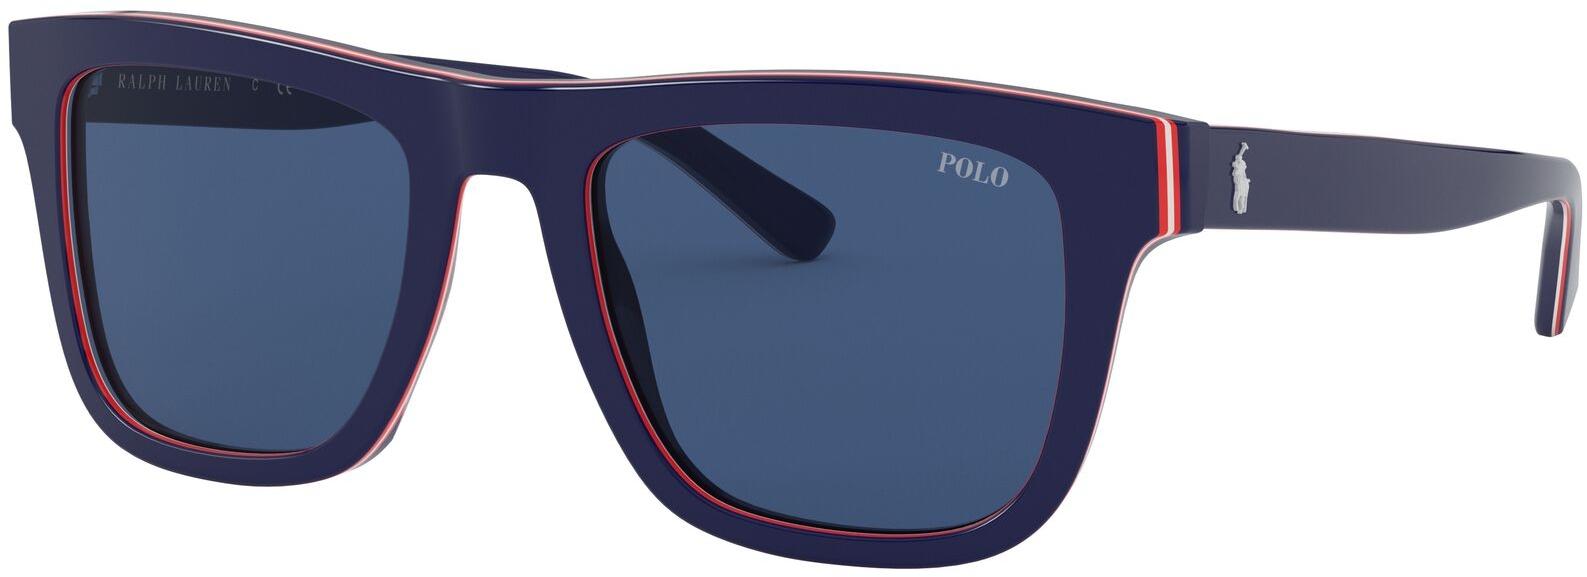 Polo Ralph Lauren PH4161-582980-52 | 8056597161770